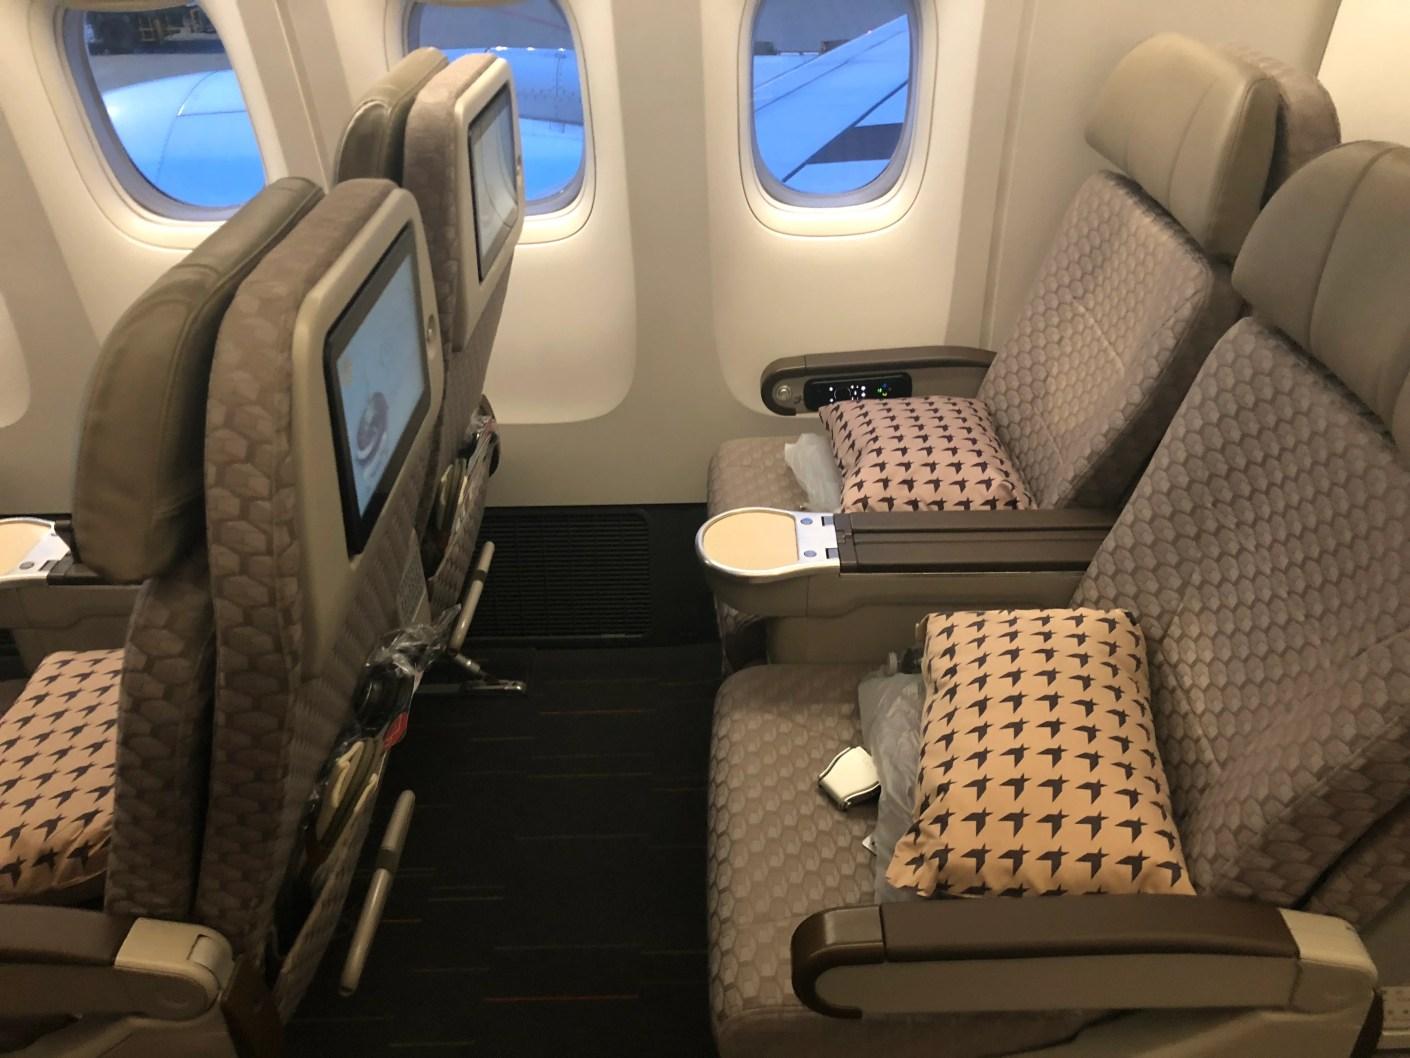 Review: EVA Air (777-300ER) Premium Economy From Taipei to JFK